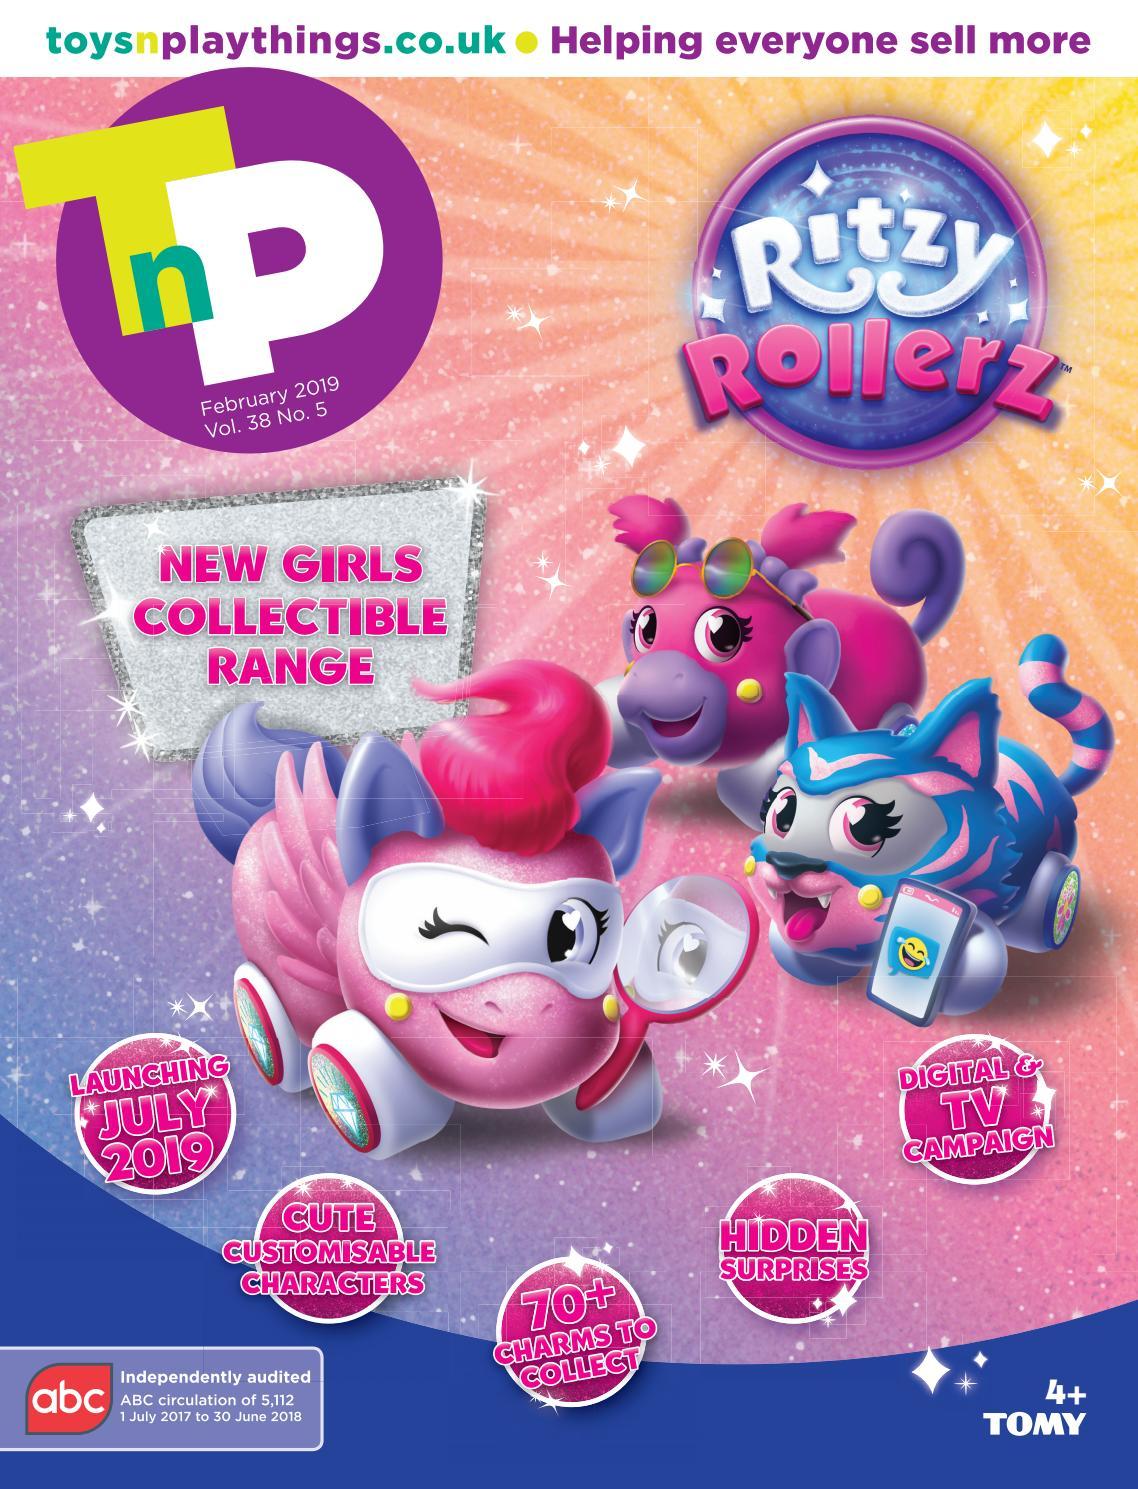 9da06b6916e9 Toys n Playthings March 2019 by Lema Publishing - issuu